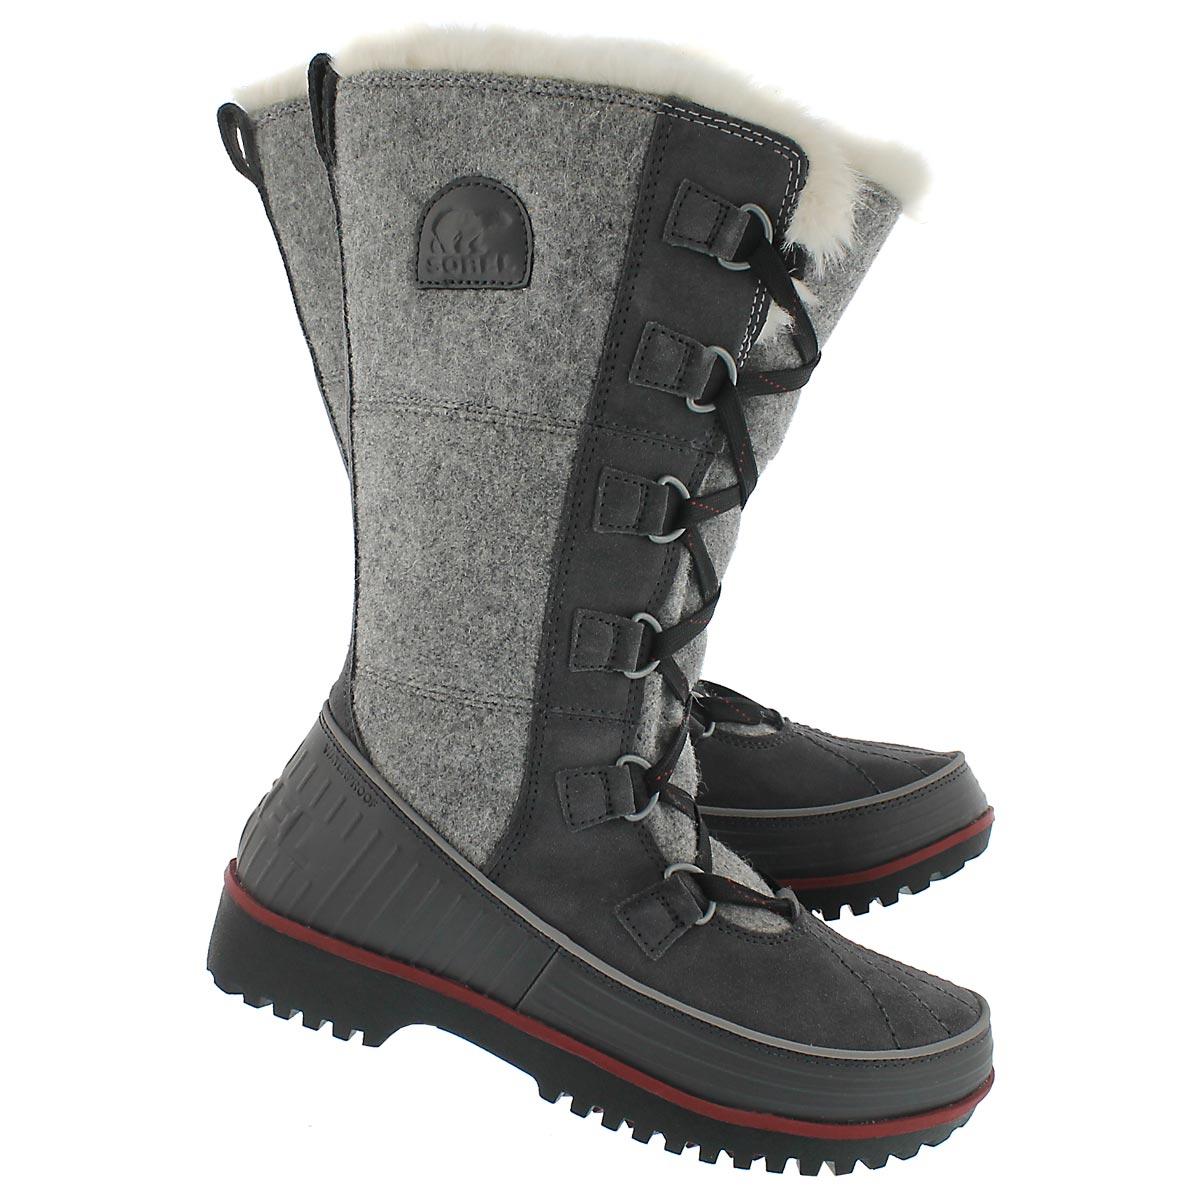 Lds Tivoli High II dk gry winter boot